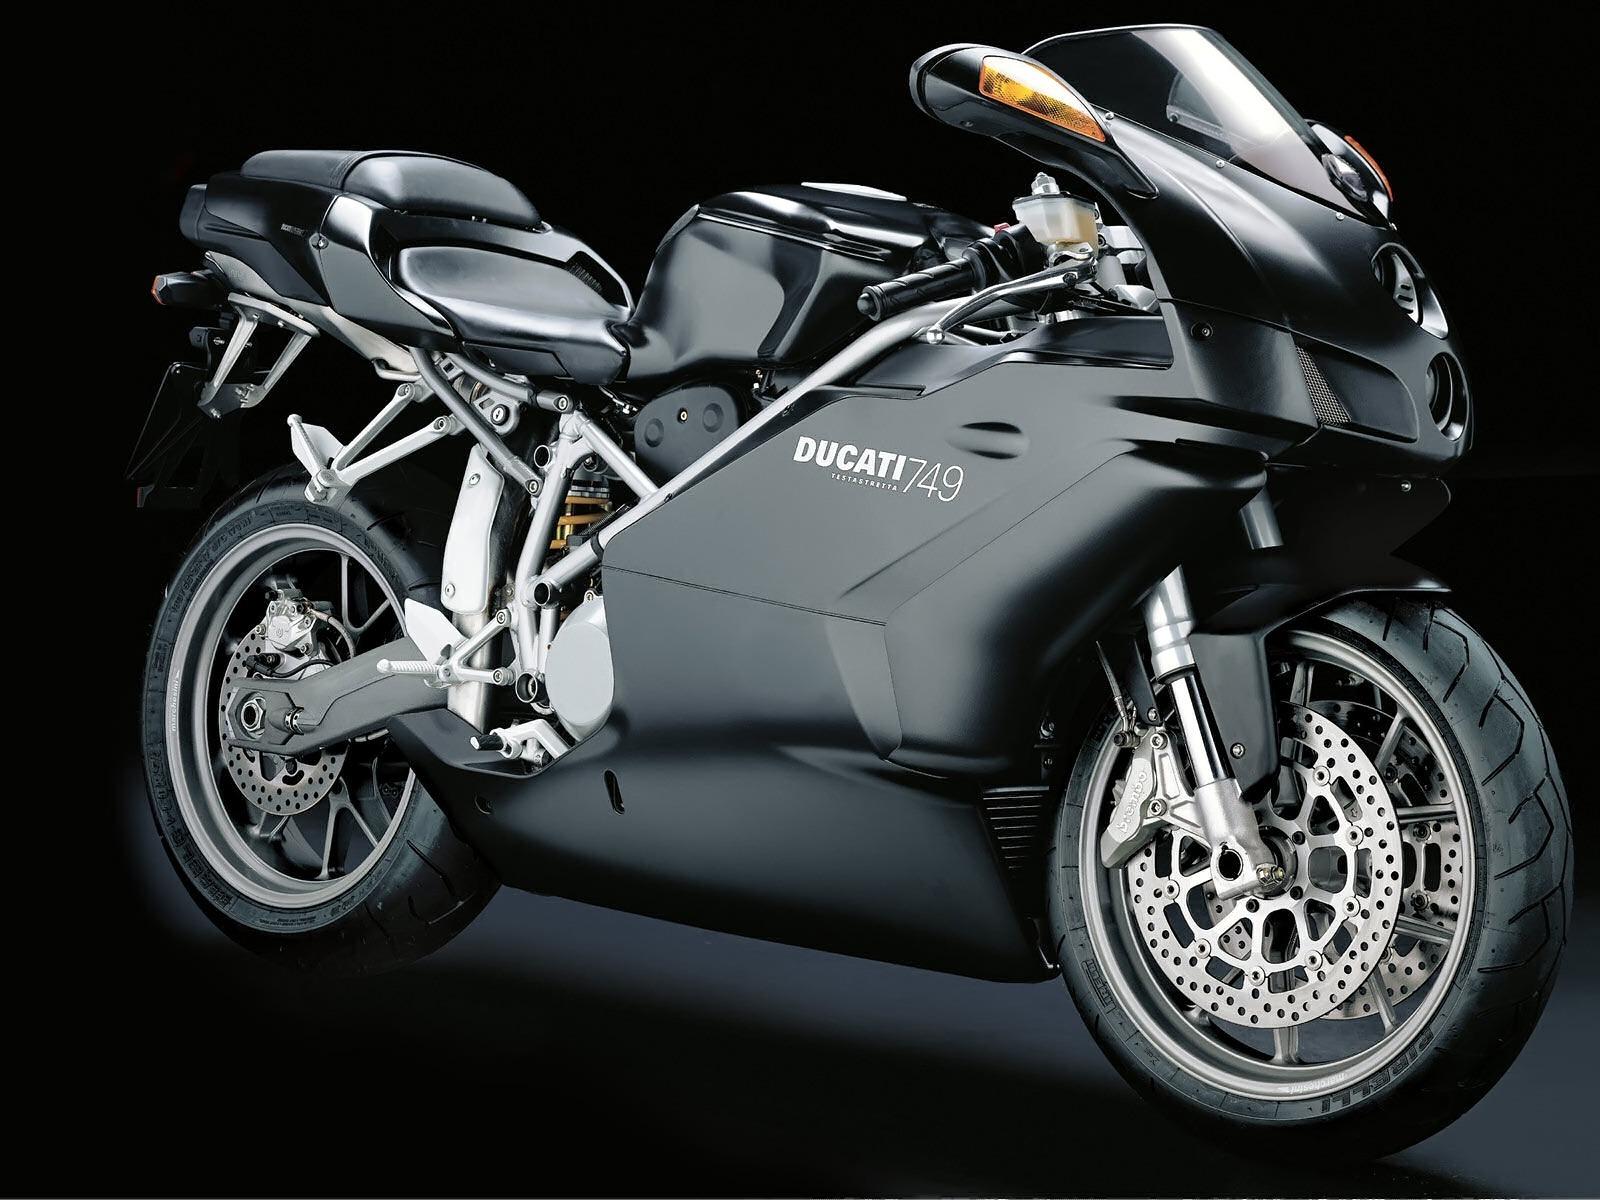 ducati 749 testastretta wallpaper ducati motorcycles wallpapers in